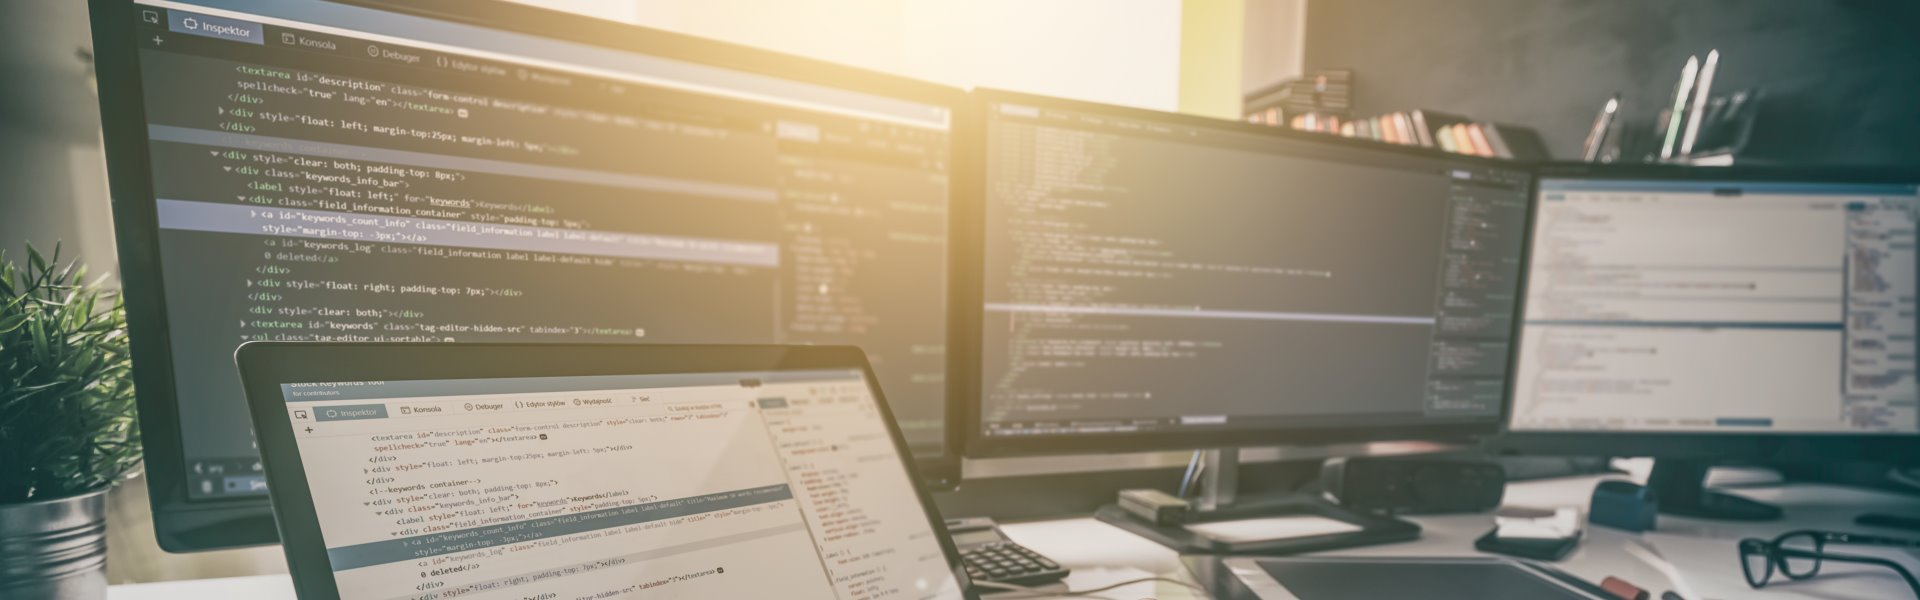 Website Repairs Halifax - Screenlevel Web Solutions - WordPress Repairs, CSS Coding, Joomla Rerpairs, Database Repairs, Drupal Repairs, Woocommerce Repairs, CorePHP Repairs, PHP MySQL Repairs